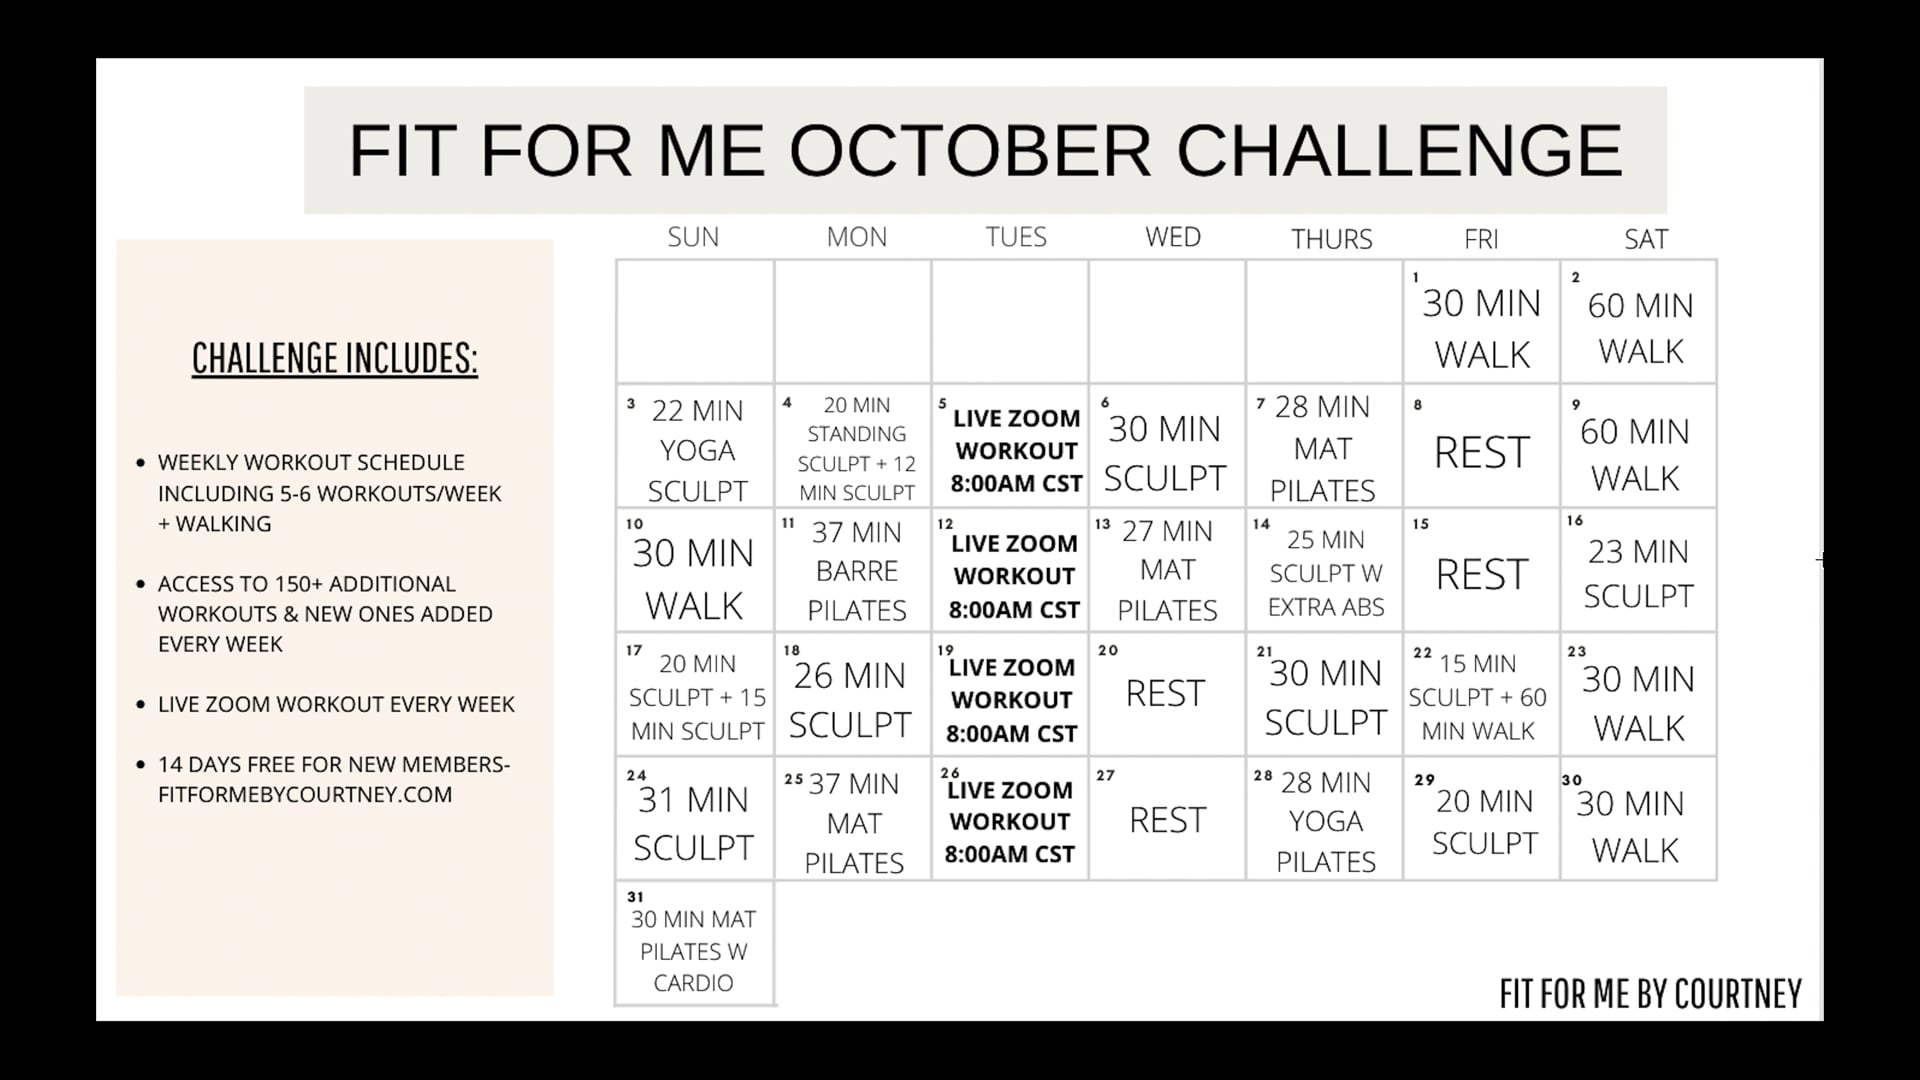 OCTOBER WORKOUT CHALLENGE